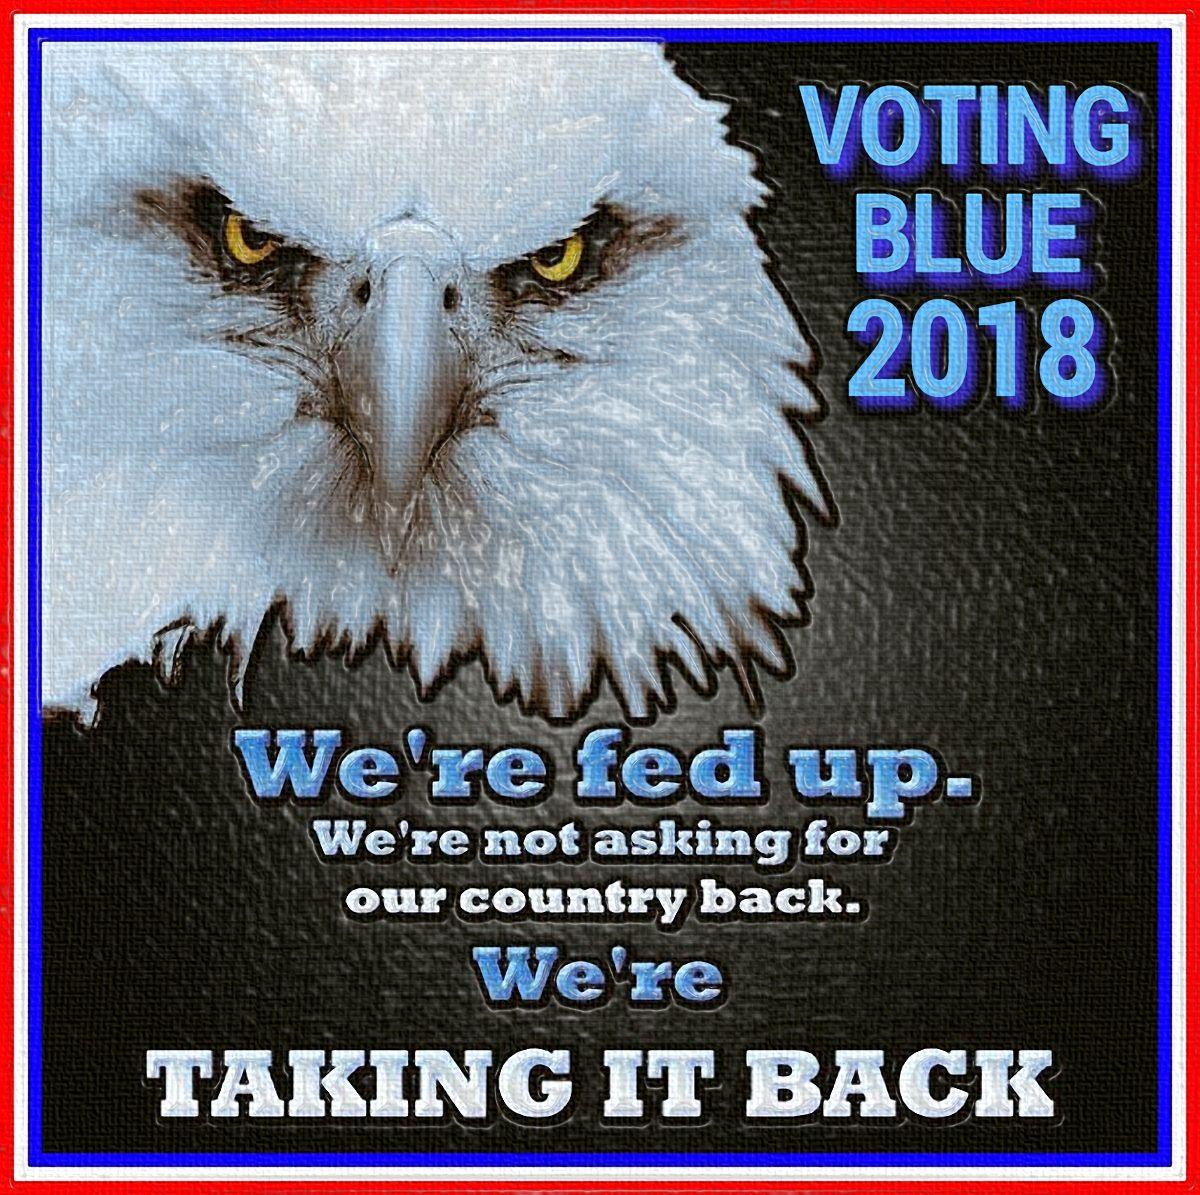 Voting Blue 2018 #VoteBlue #BlueWave #BlueWave2018<br>http://pic.twitter.com/cpRu84vA1g